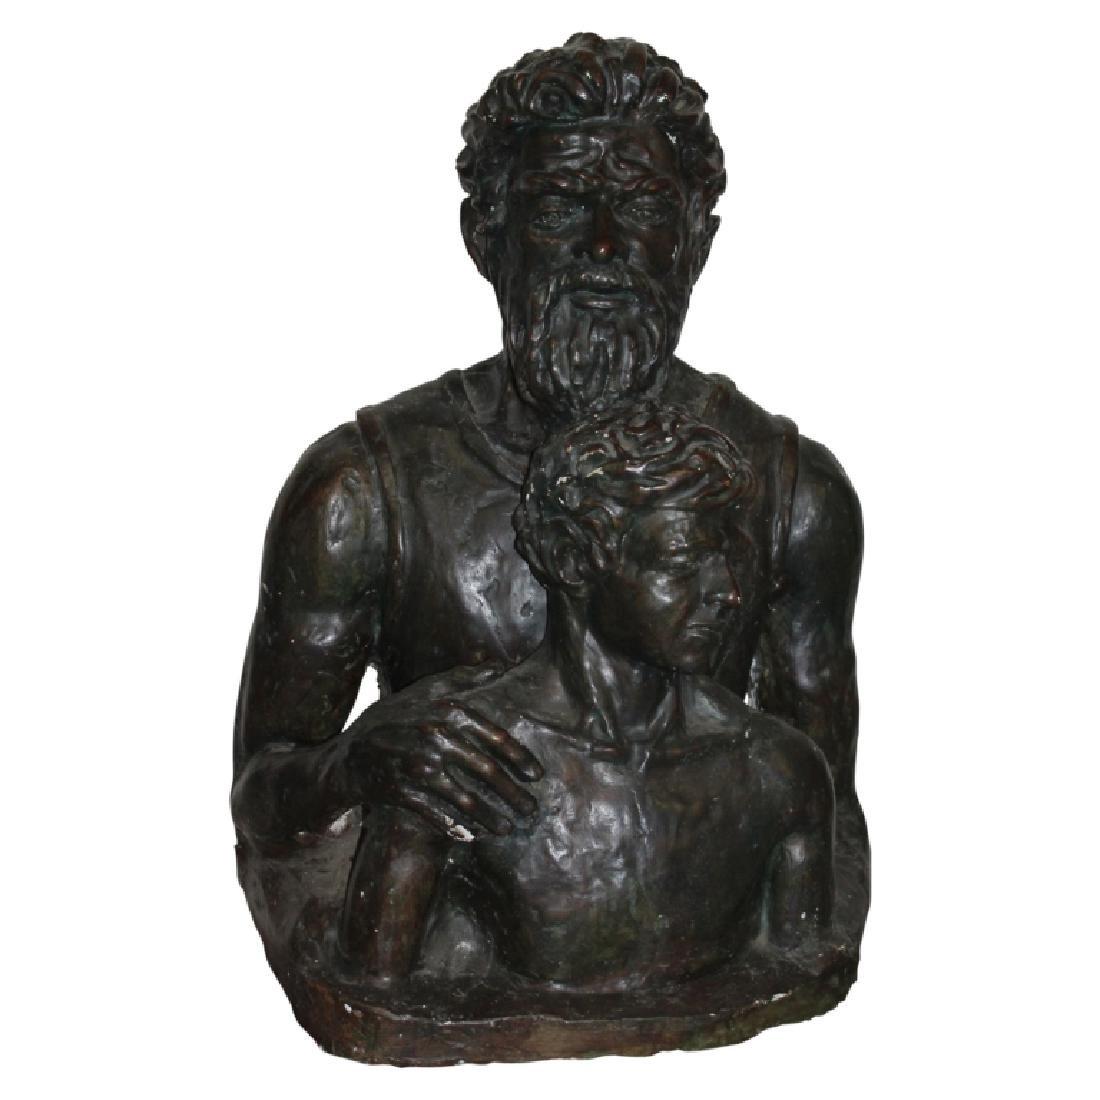 Large Greek Sculpture